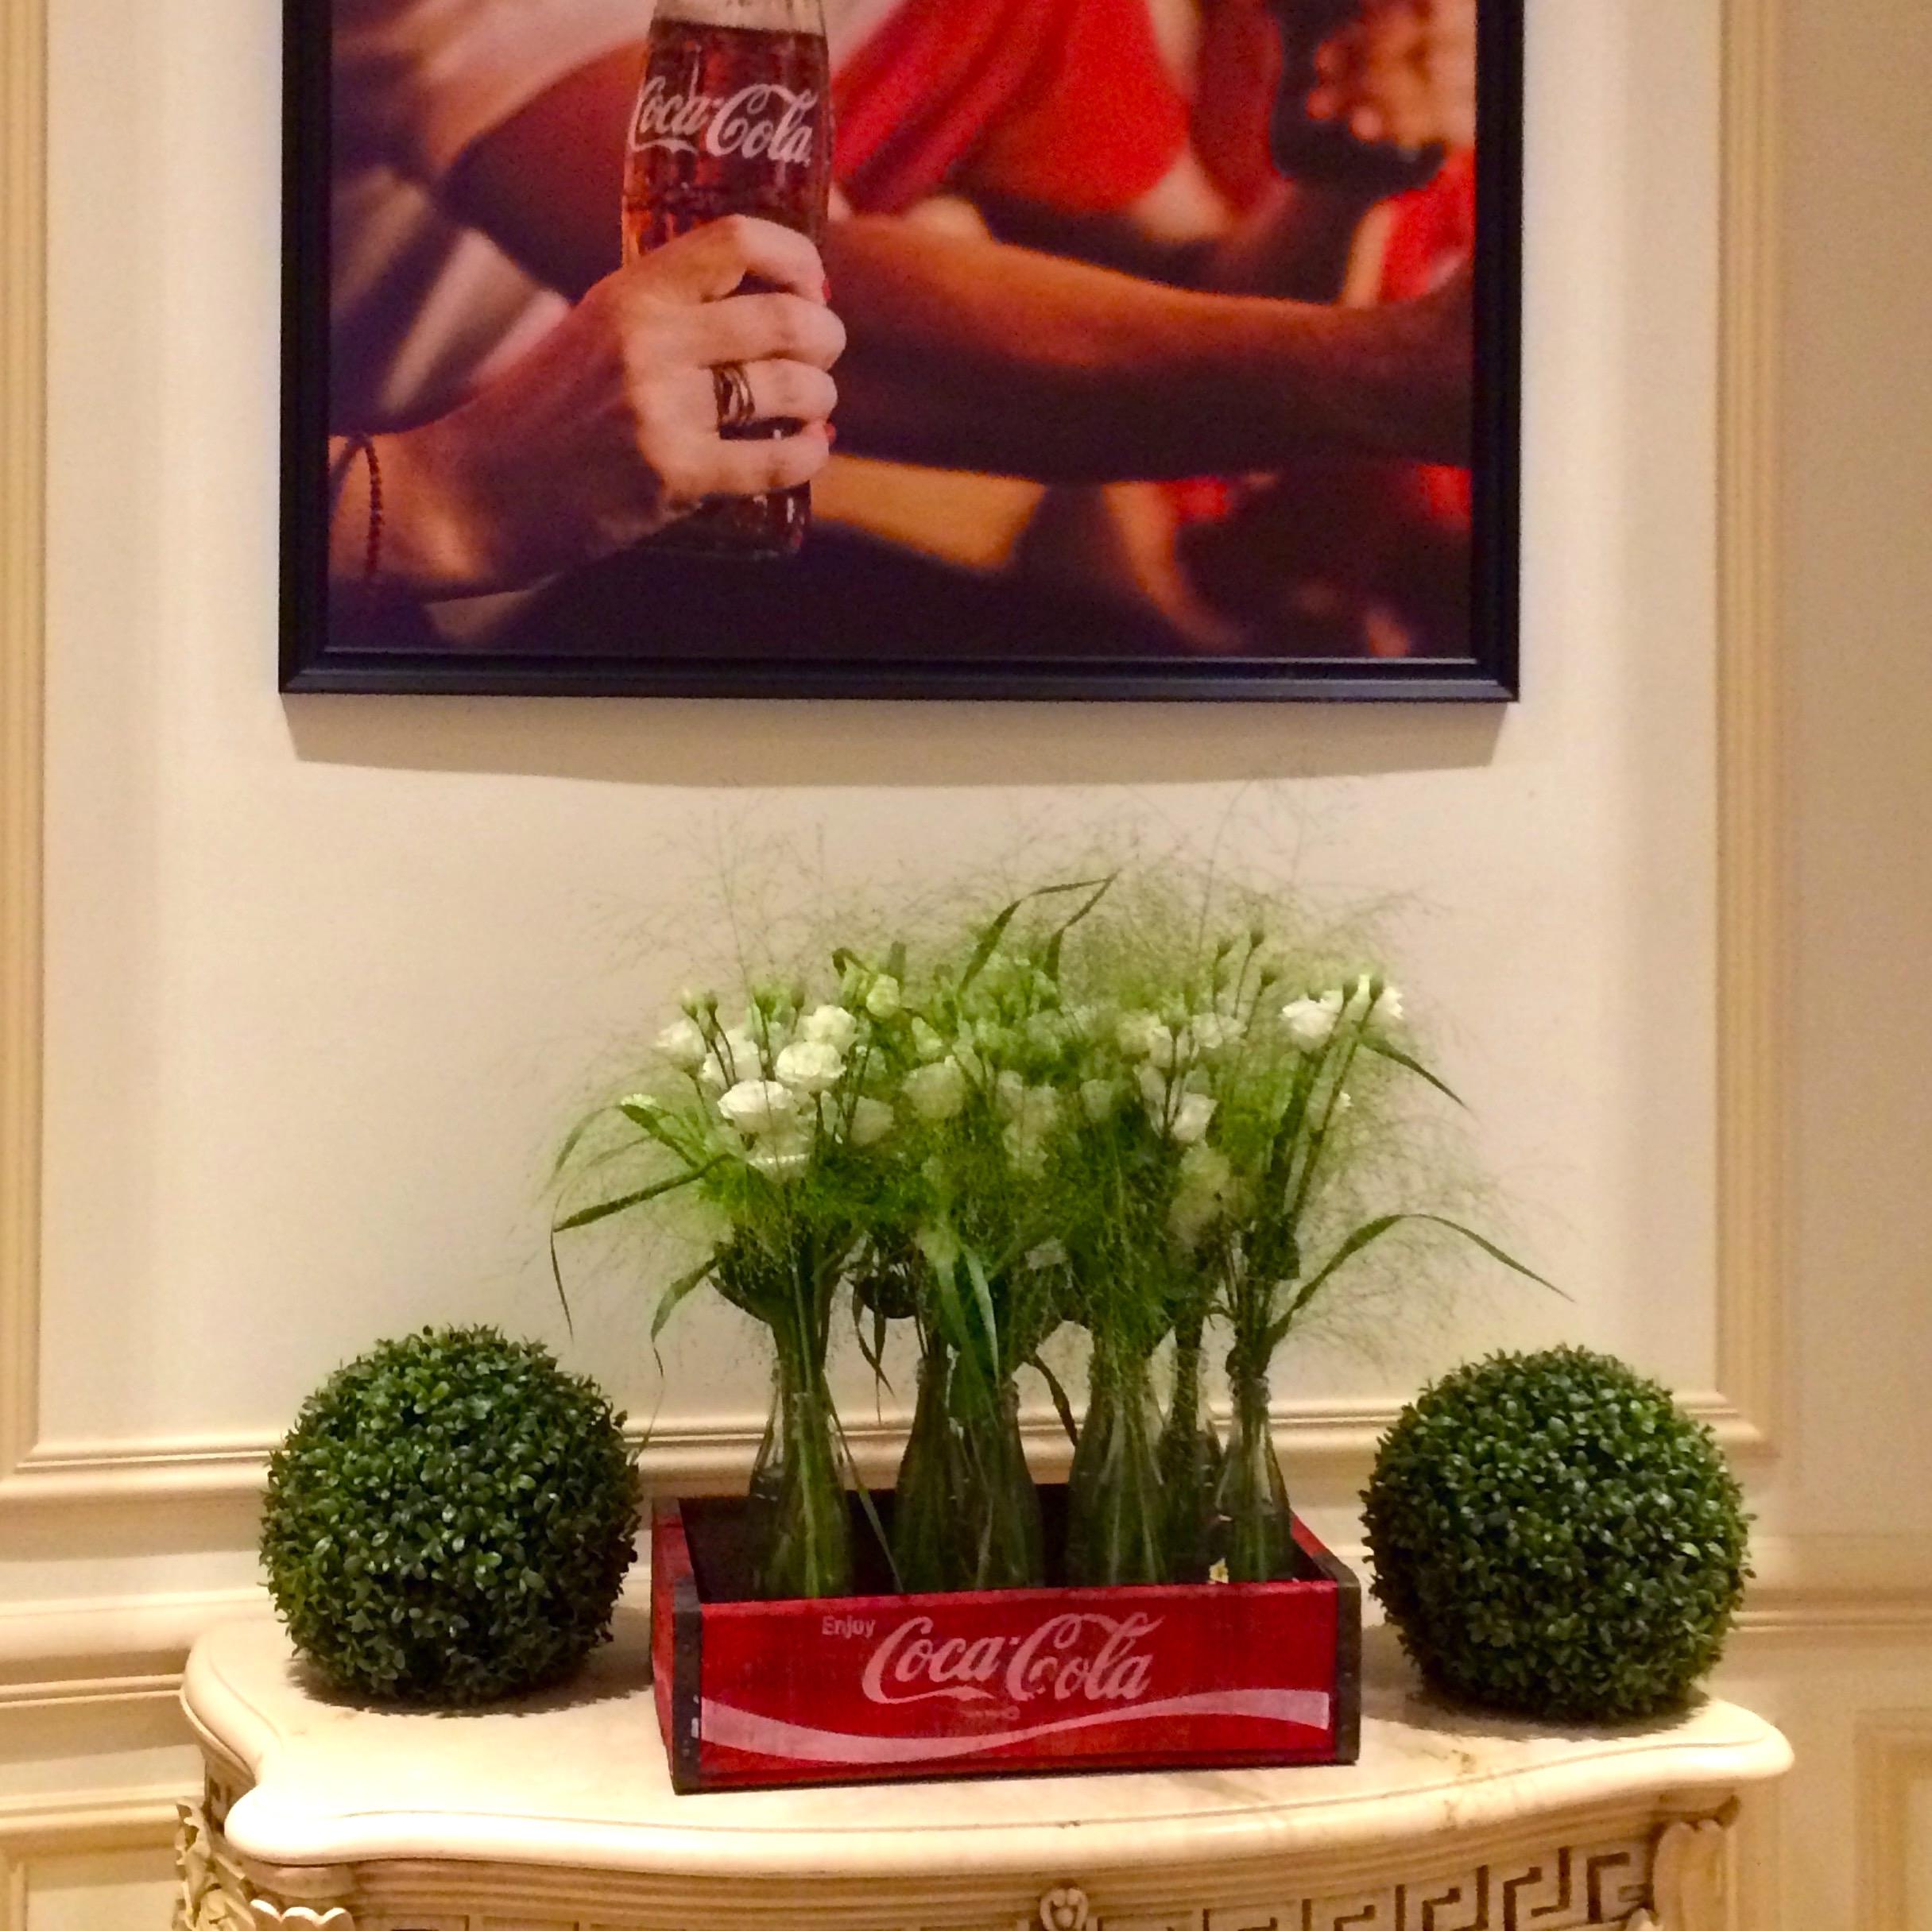 Christian Morel Fleuriste Paris - Evenement coca cola